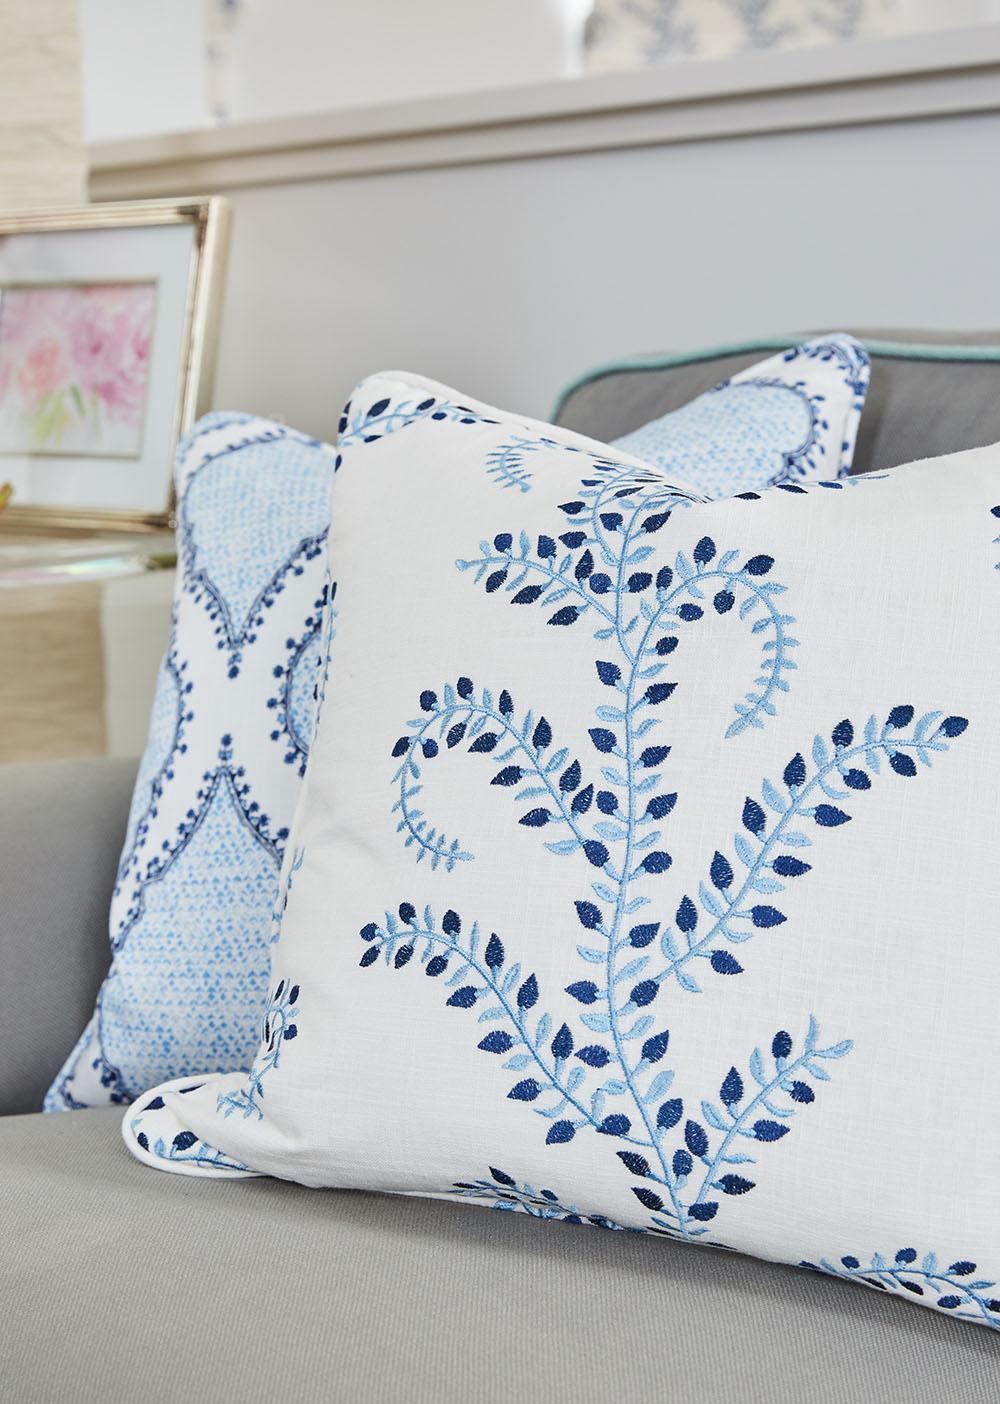 Mimosa-Lane-Blog-One-Room-Challenge.jpg, John-RObshaw-pillow